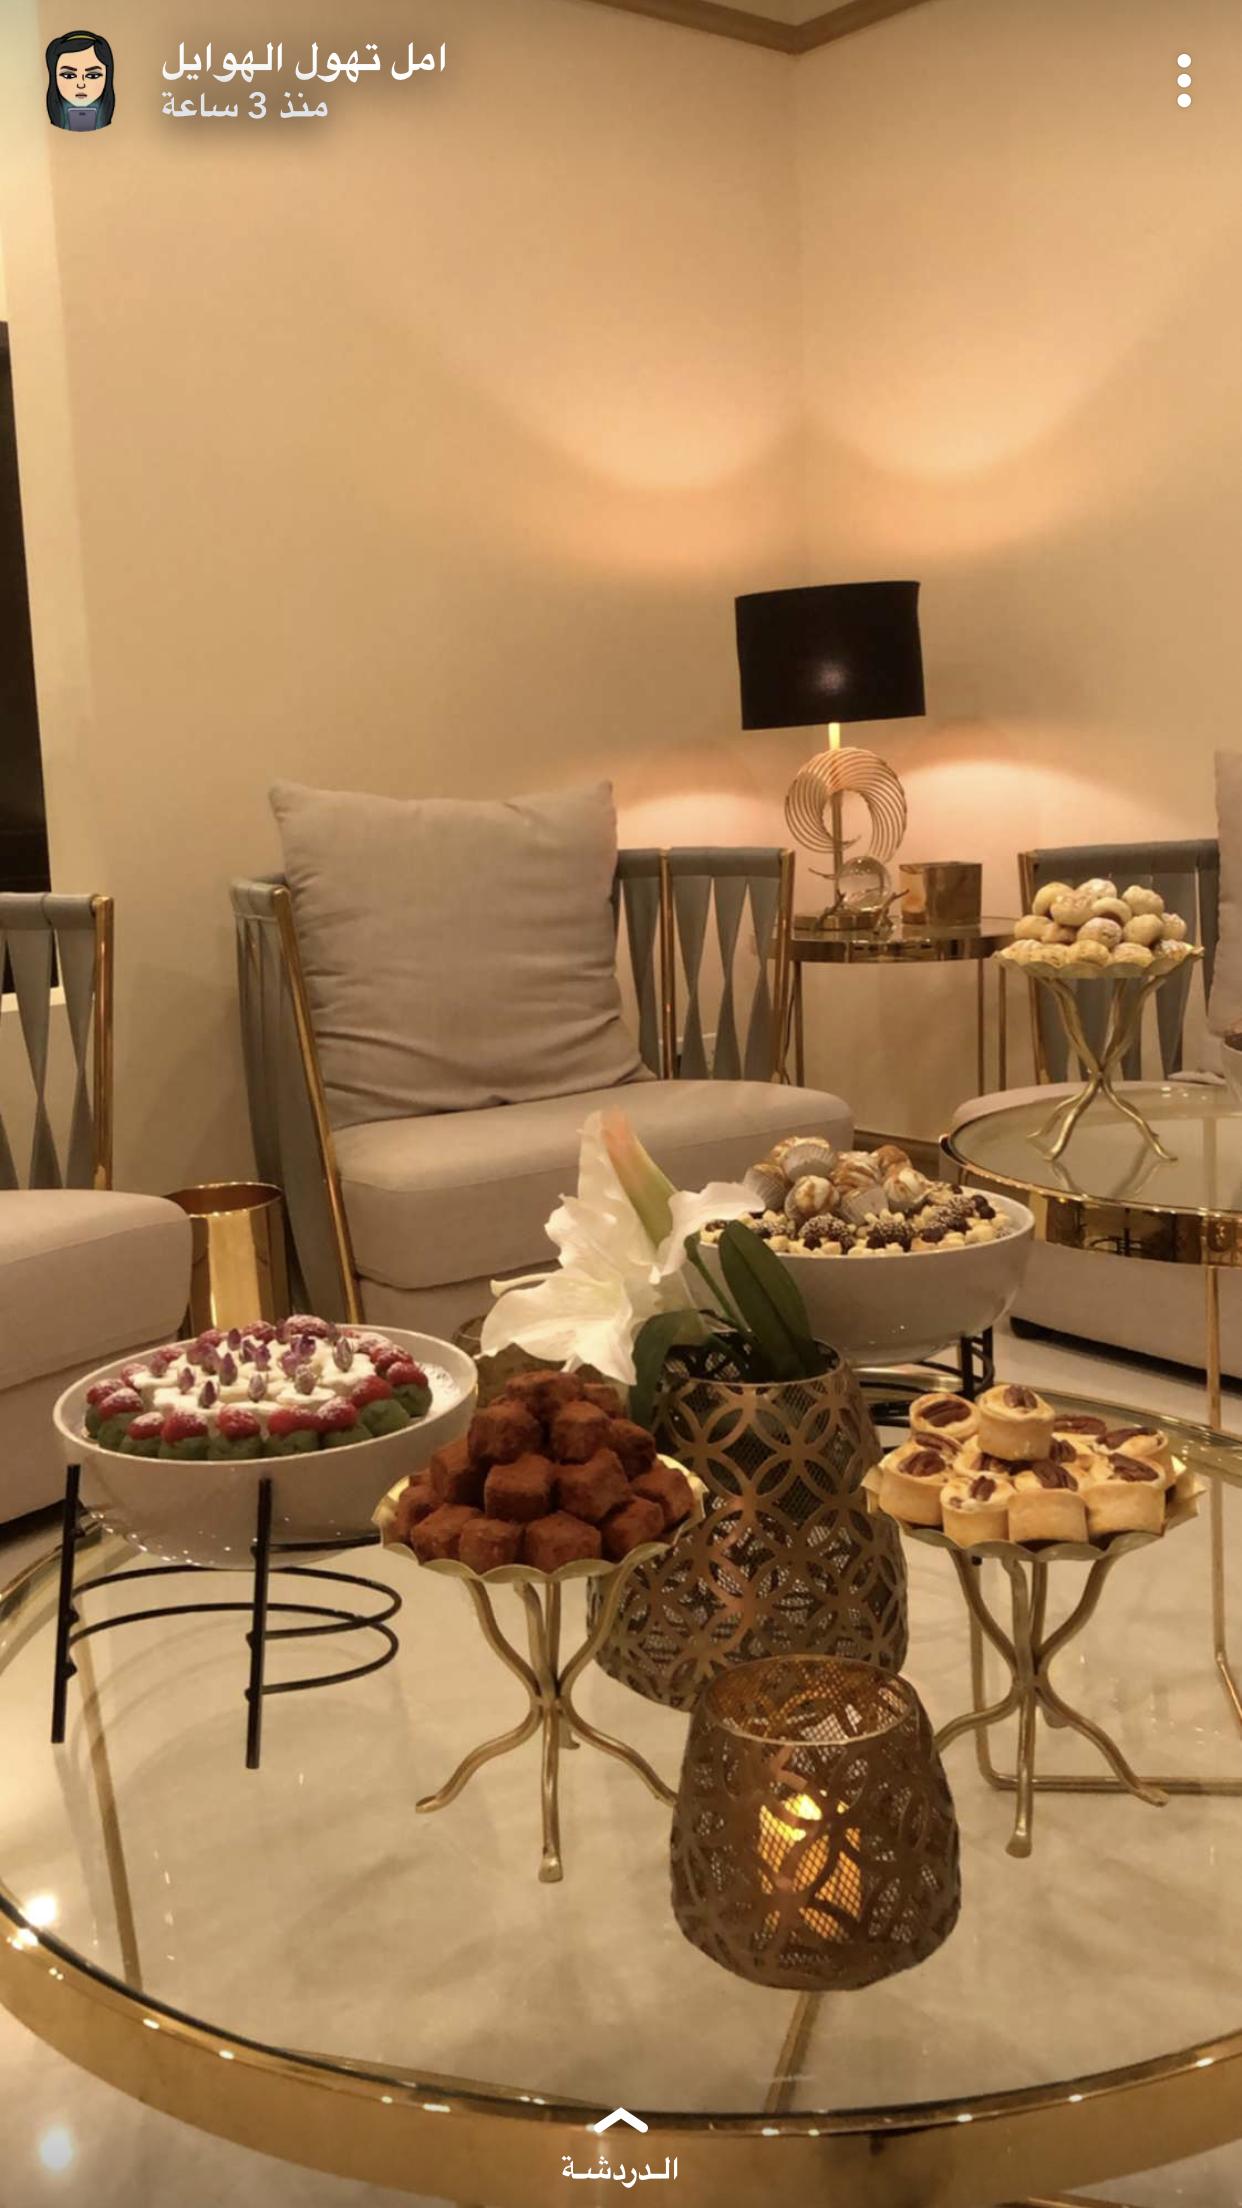 Pin By Shomooo3 Almatar On Decor Decor Home Living Room Living Room Design Decor Arabian Decor